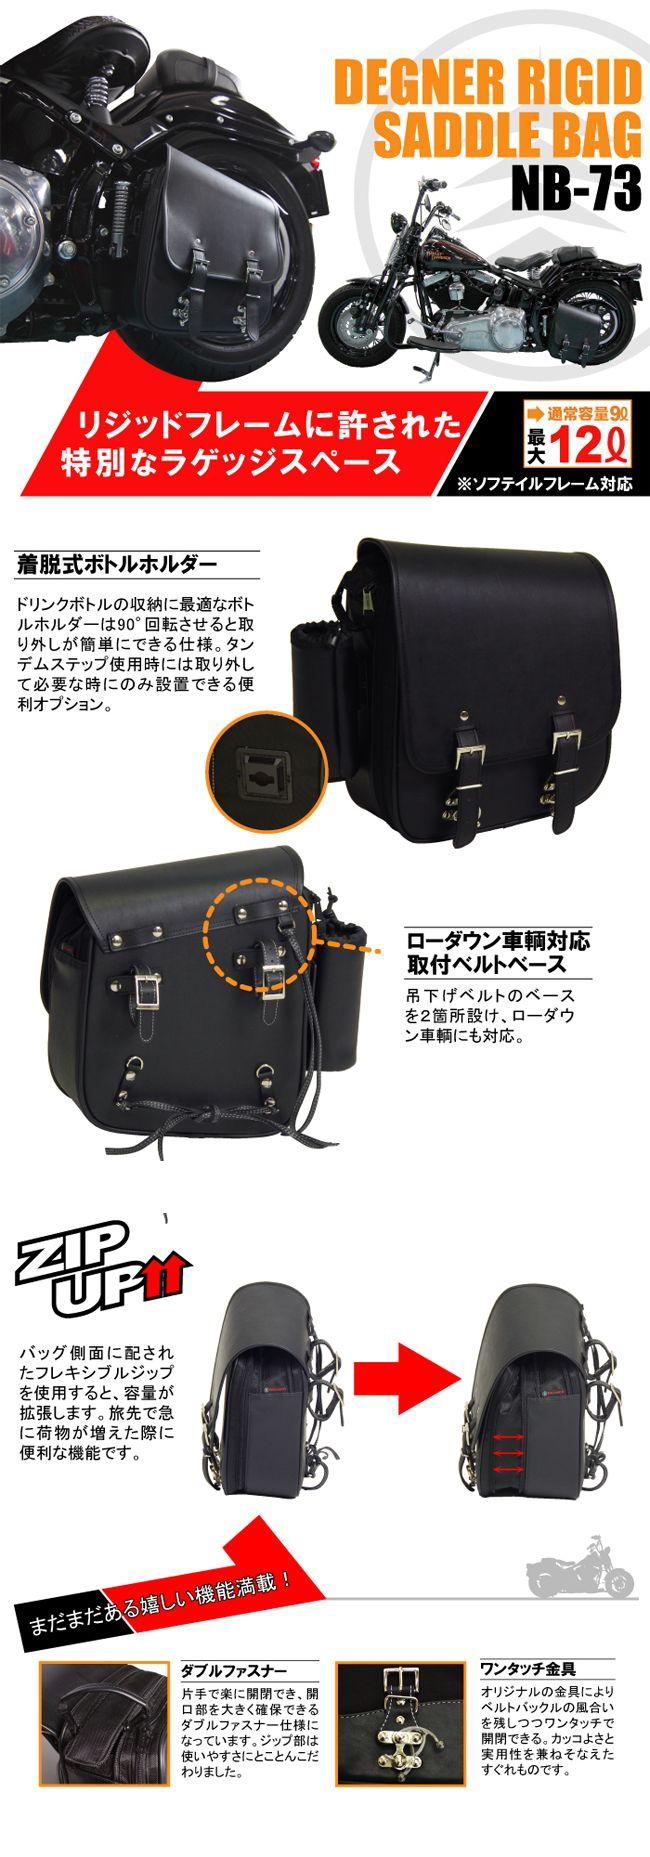 【DEGNER】Rigid 側掛包 - 「Webike-摩托百貨」